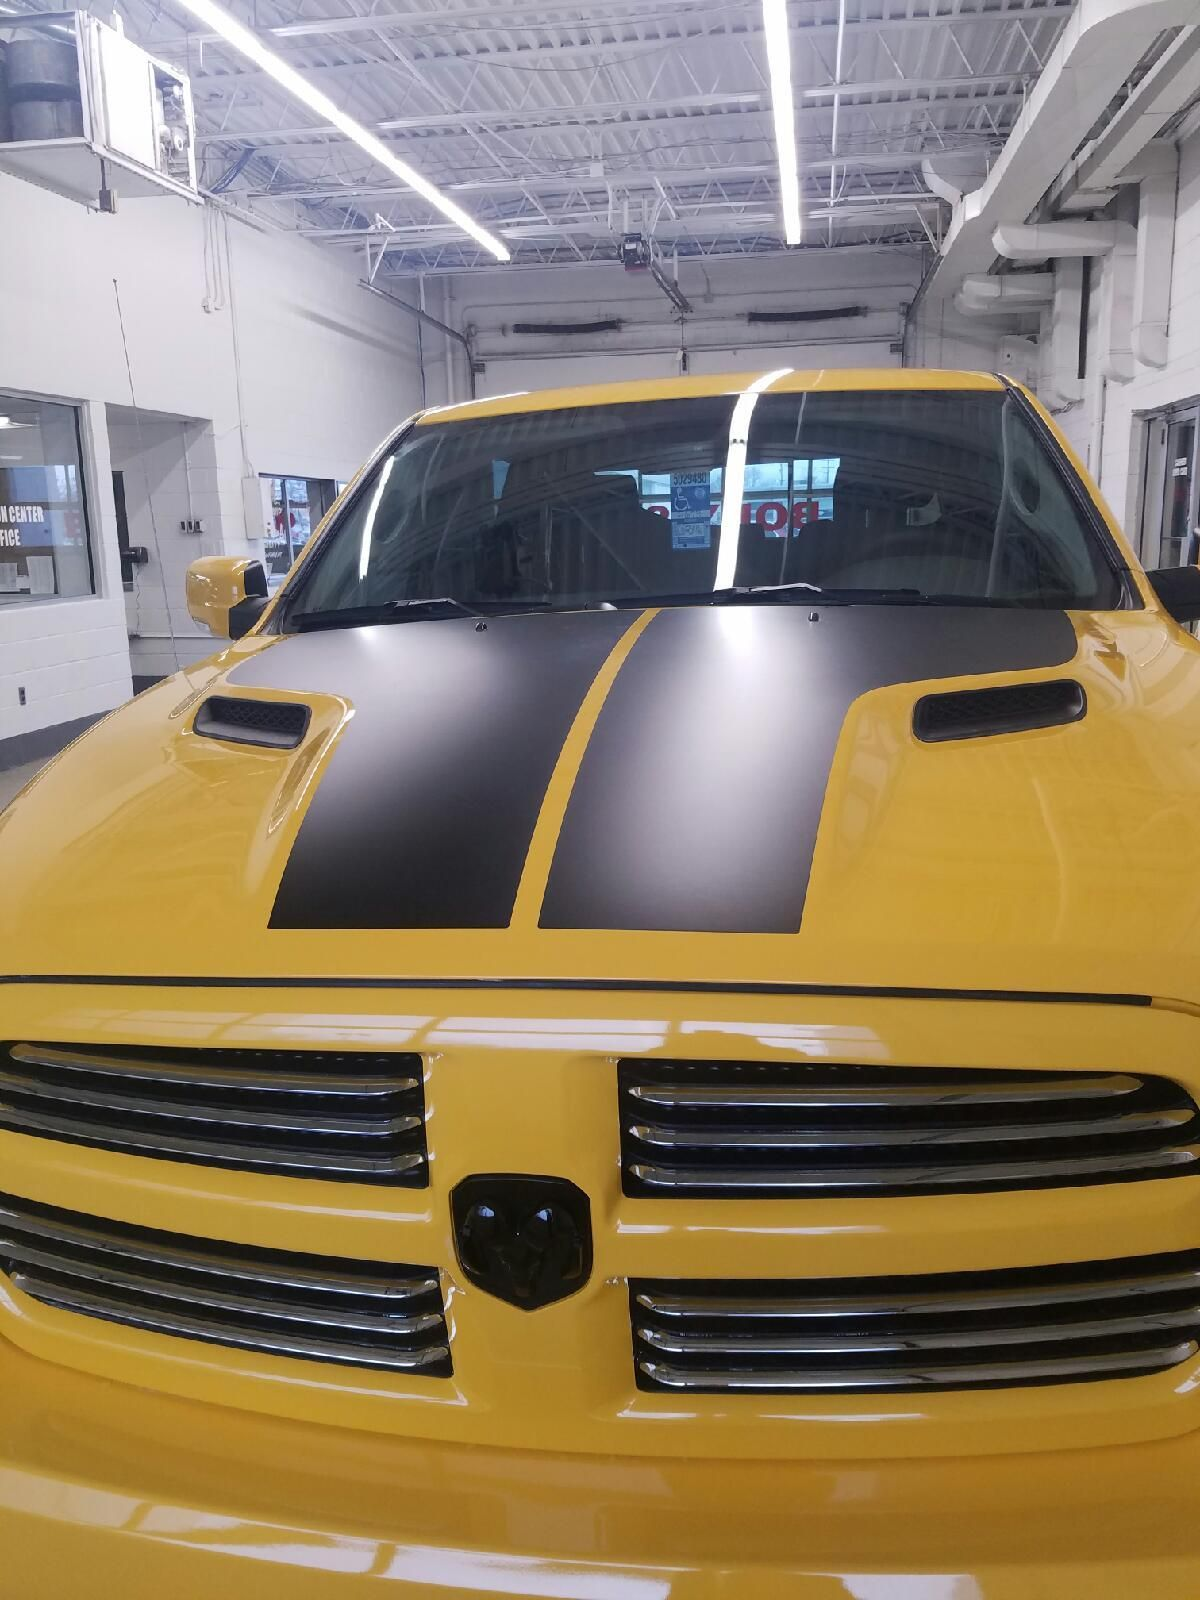 Break Up All That Color Telegraph Chrysler Flat Black Hood